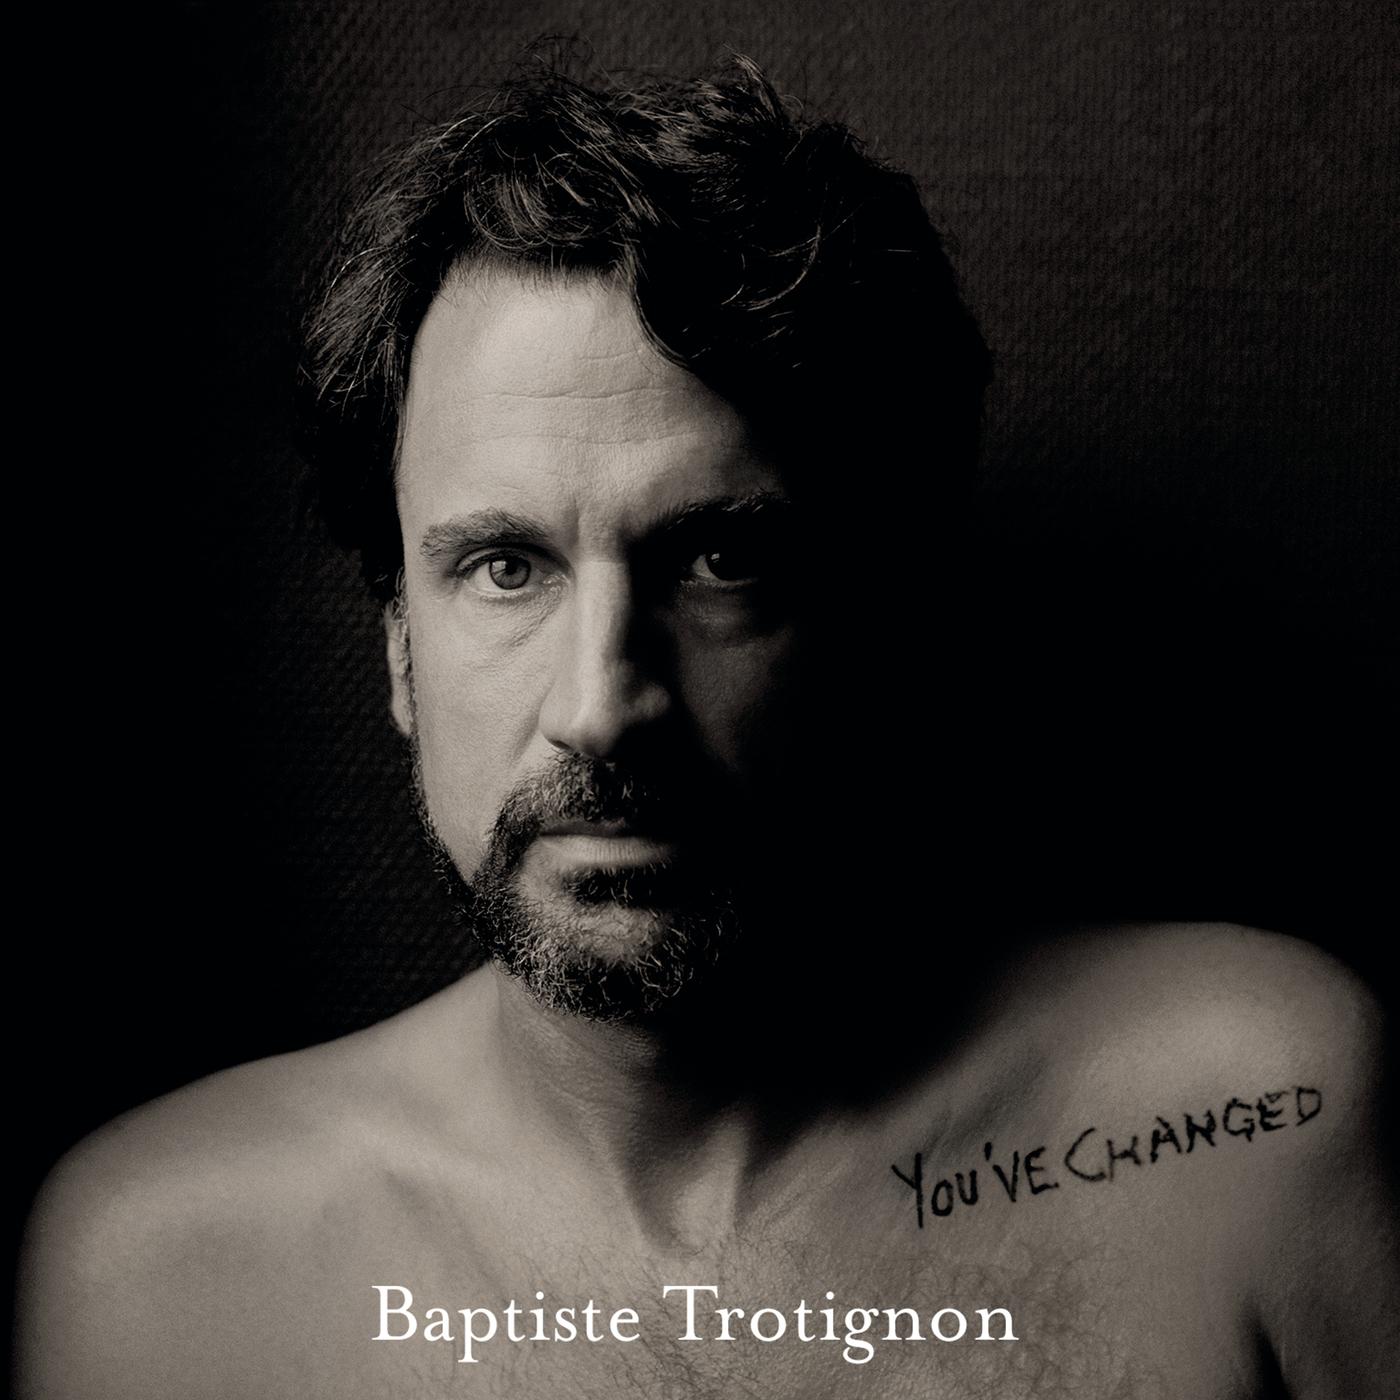 You've Changed - Baptiste Trotignon